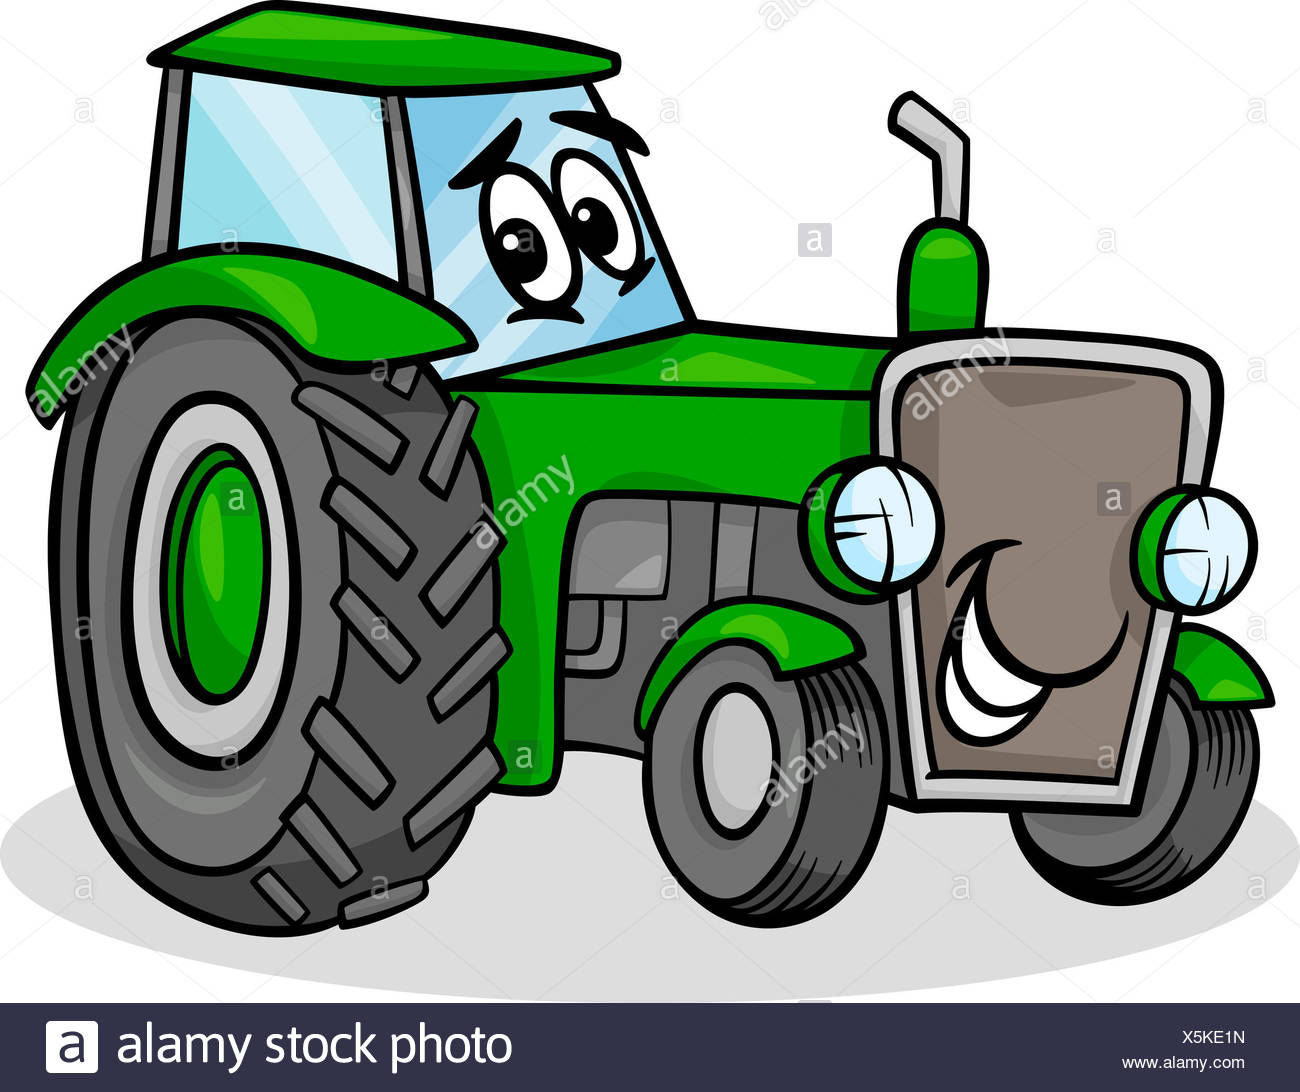 Agriculture Farming Toy Illustration Farm Tractor Cartoon